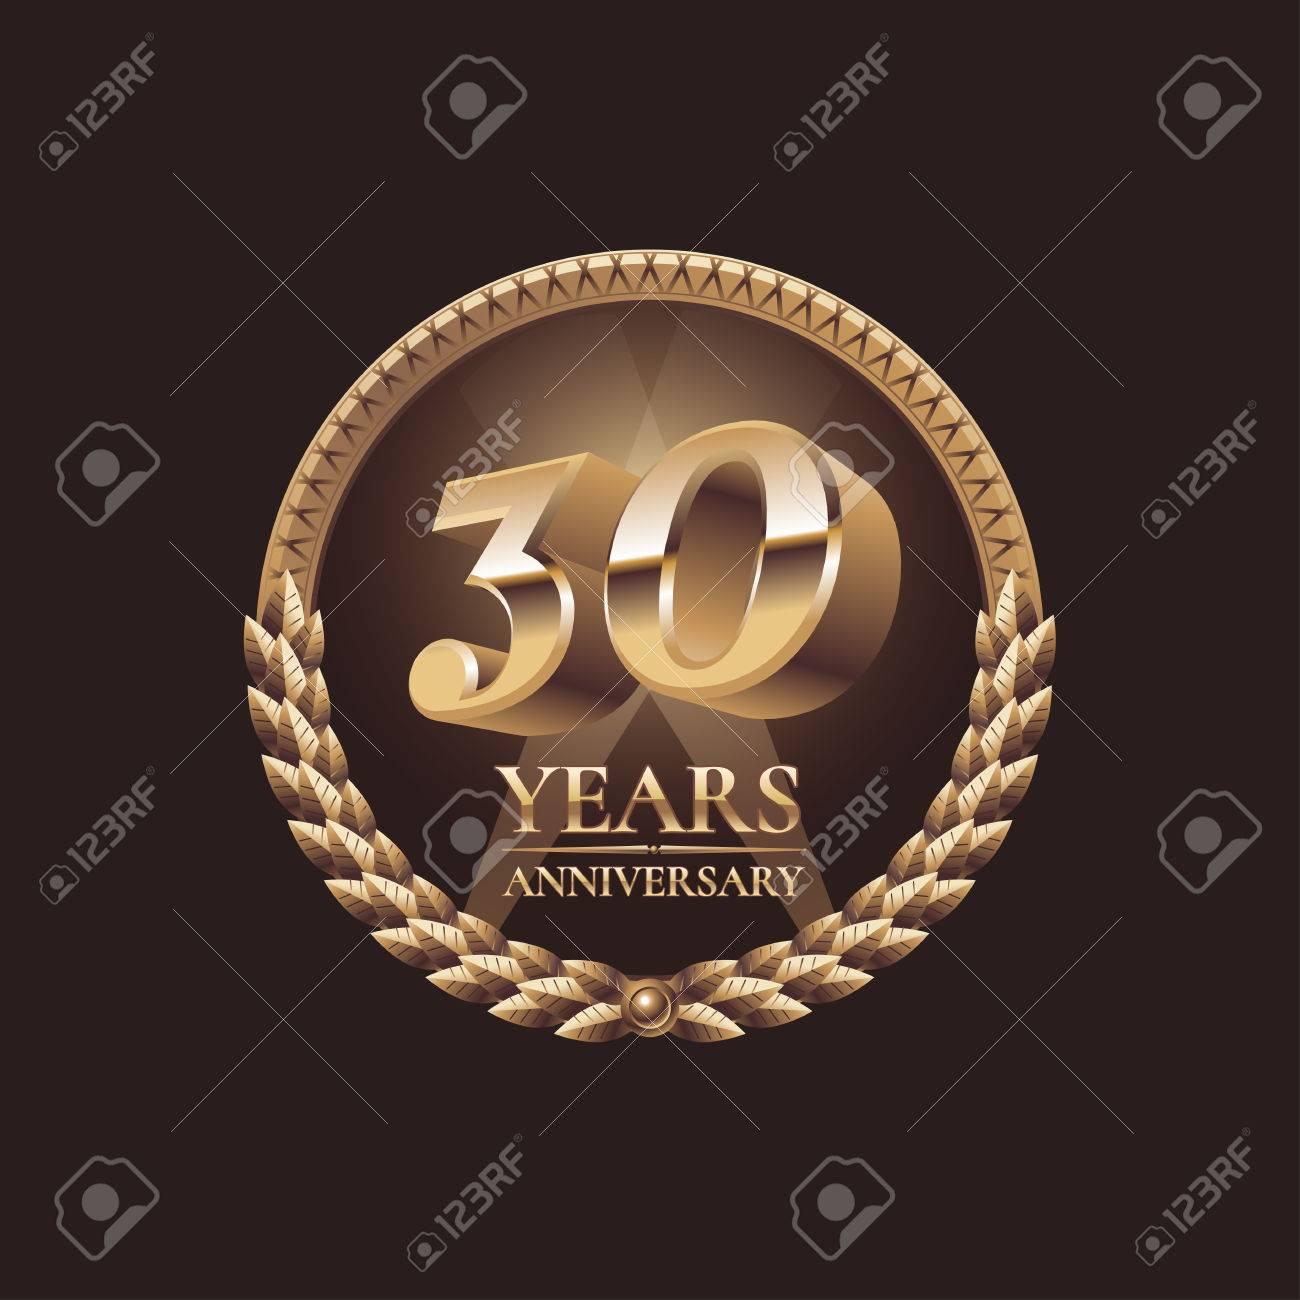 30 years anniversary vector icon 30th celebration design golden 30 years anniversary vector icon 30th celebration design golden jubilee symbol stock vector kristyandbryce Choice Image